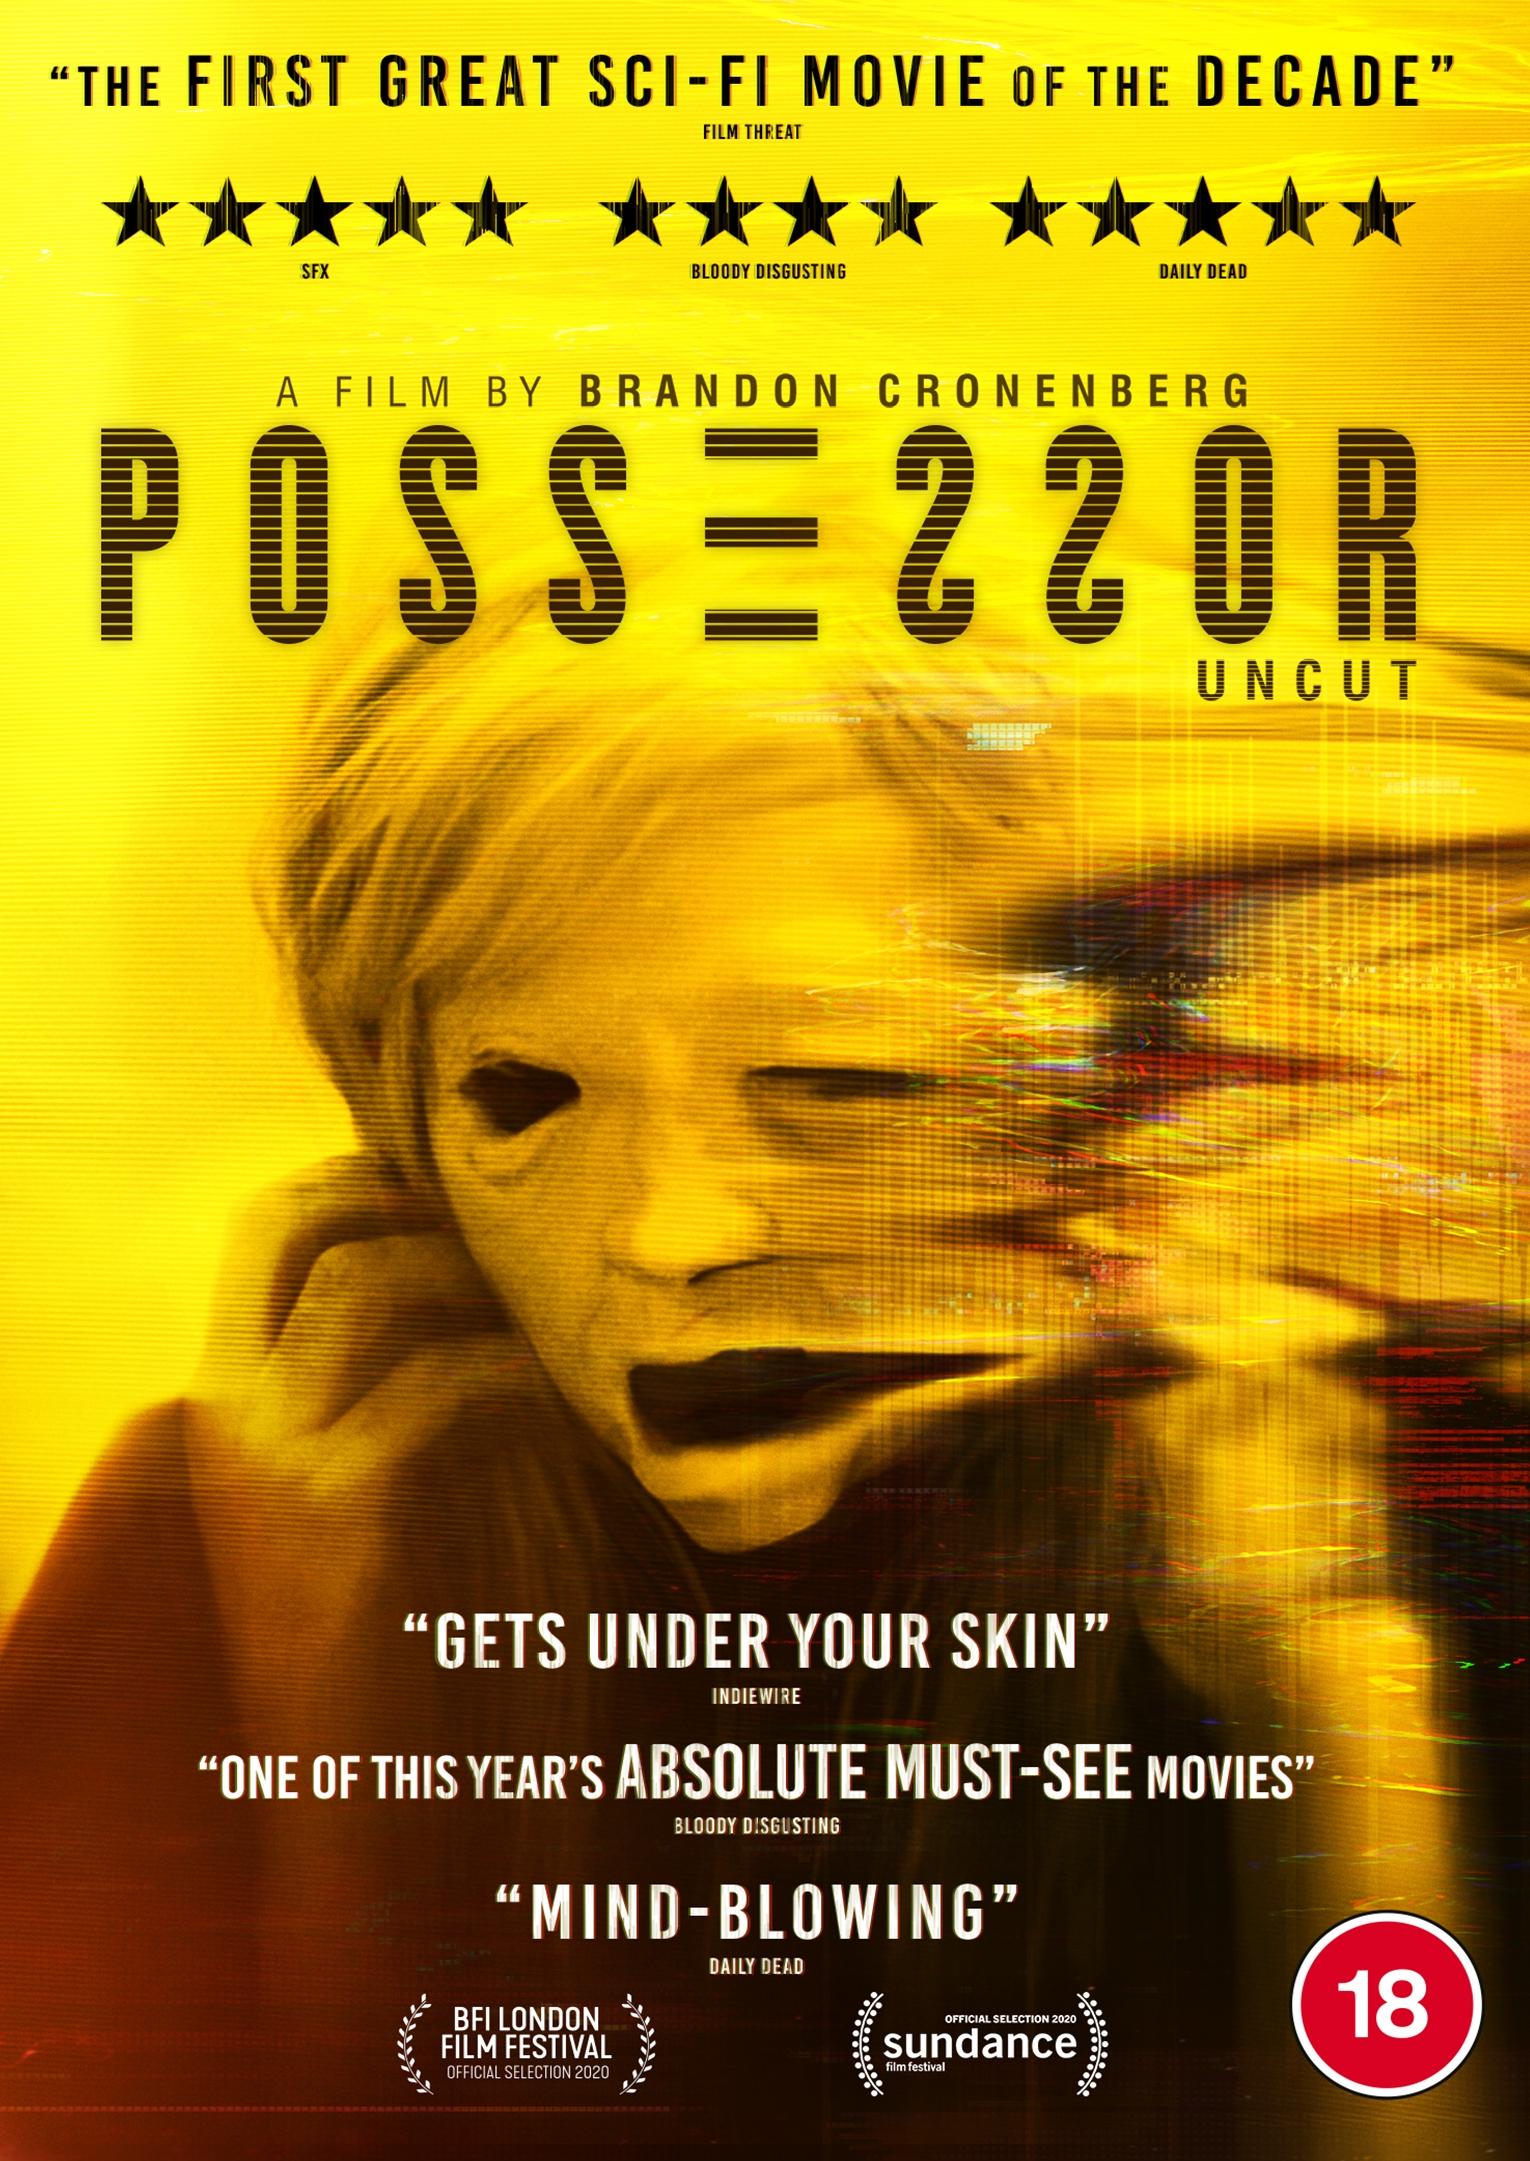 Signature Entertainment Presents Brandon Cronenberg's POSSESSOR on Digital HD (UK / 1 February) & Blu-ray/DVD (UK / 8 February)